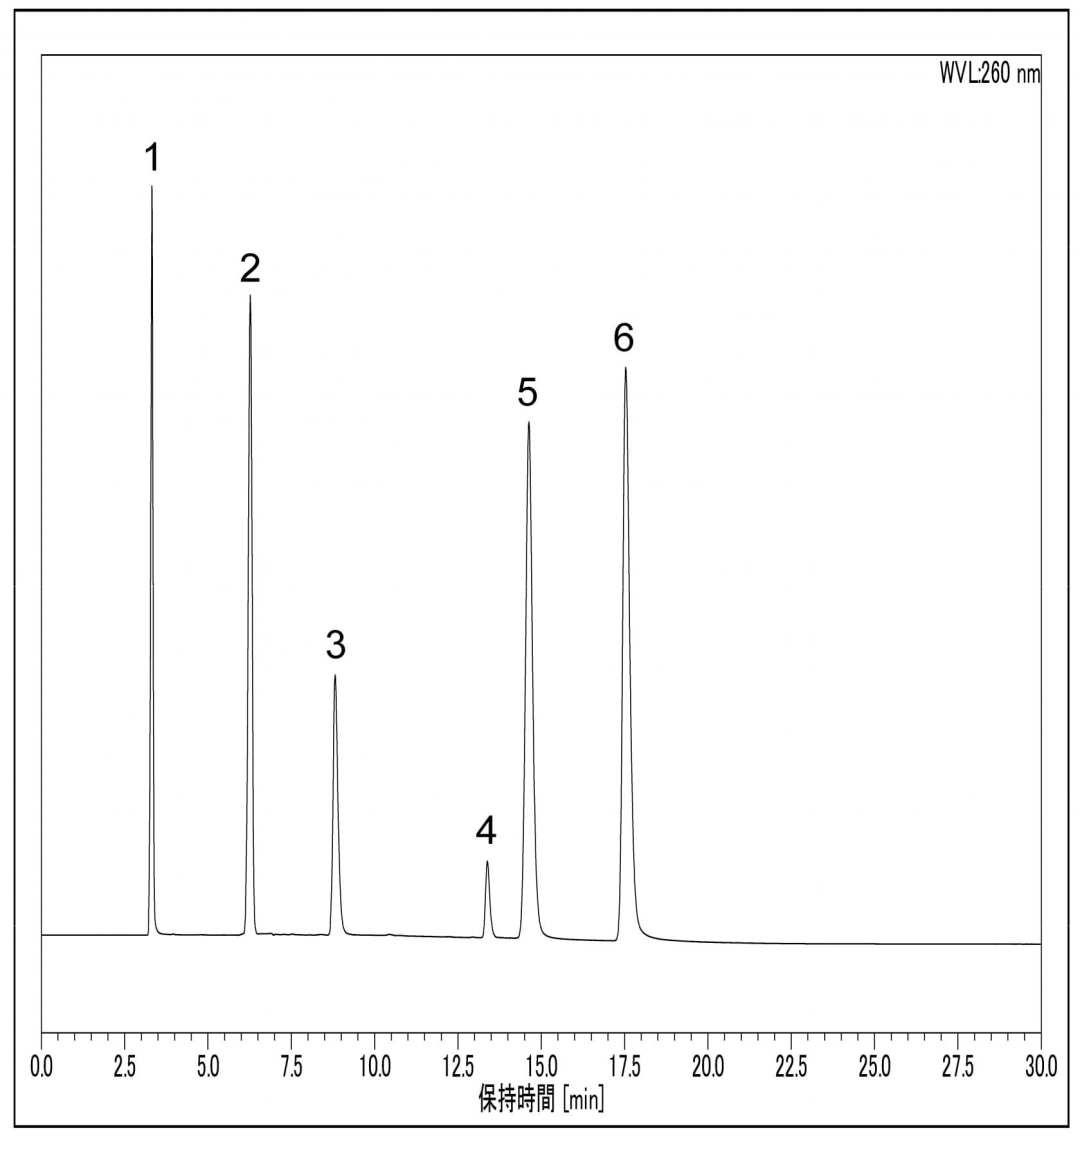 Analysis of Water Soluble Vitamins using HPLC-RI